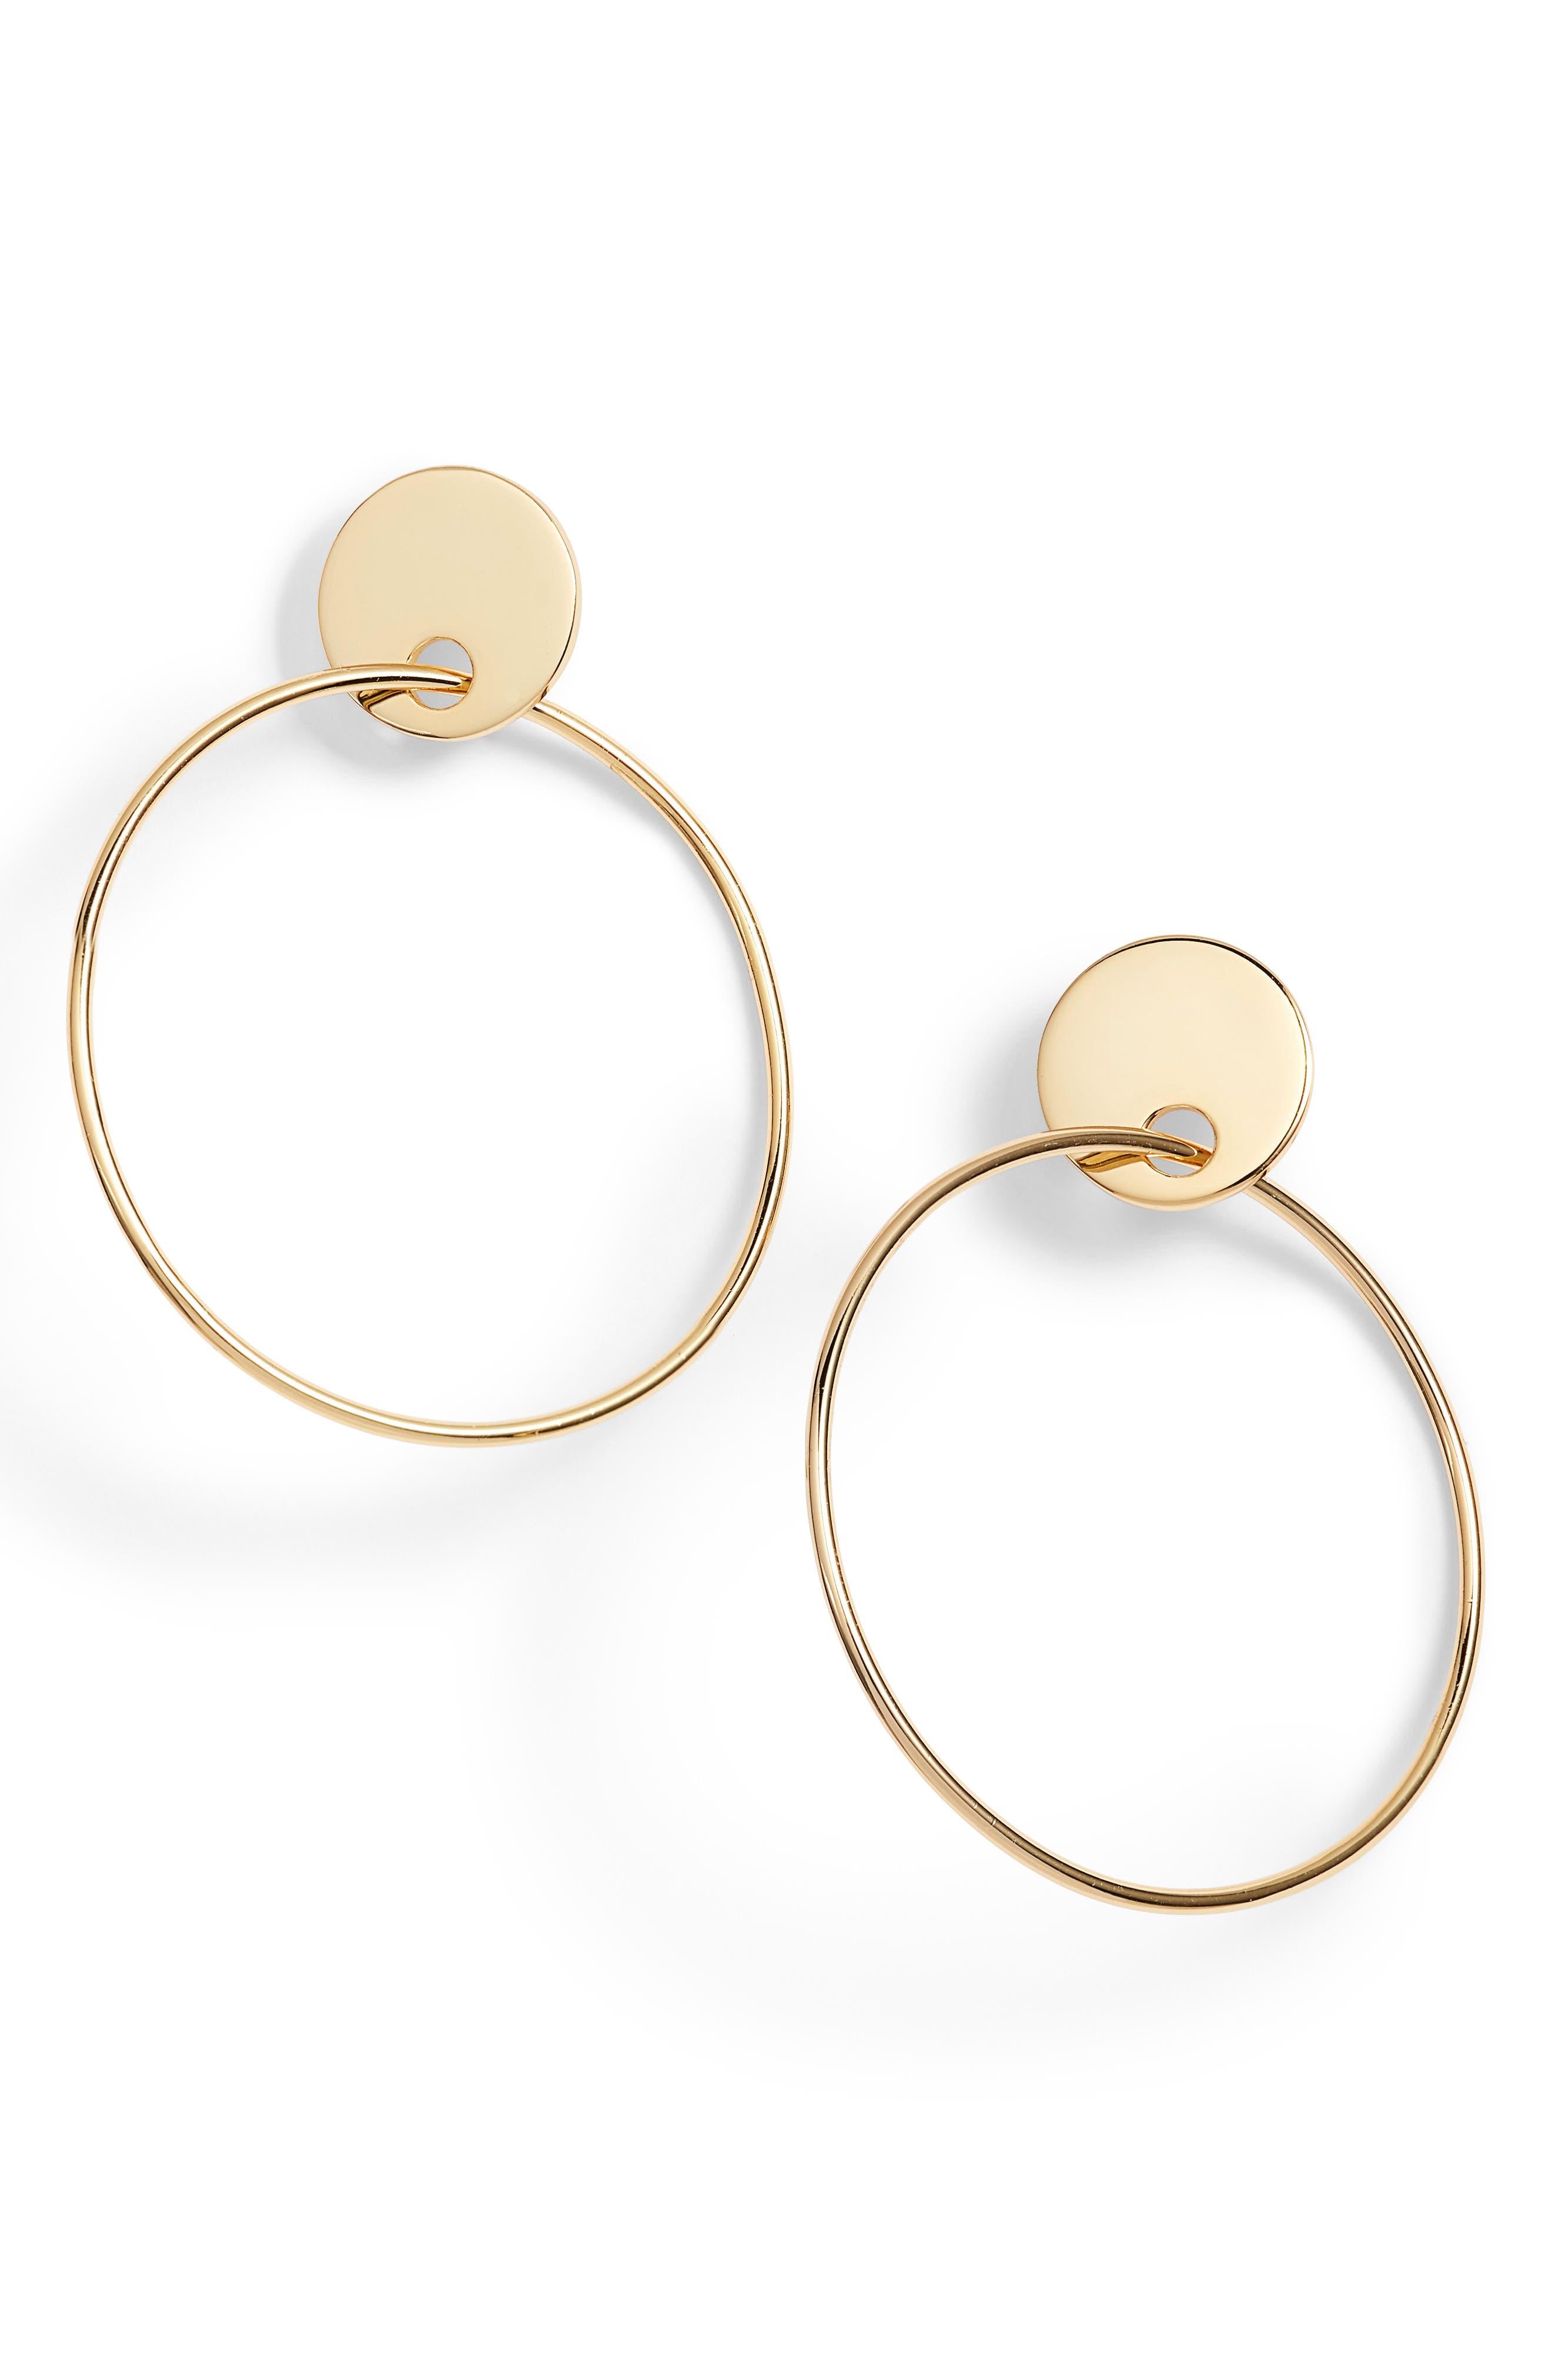 JULES SMITH Imogen Hoop Earrings, Main, color, 710